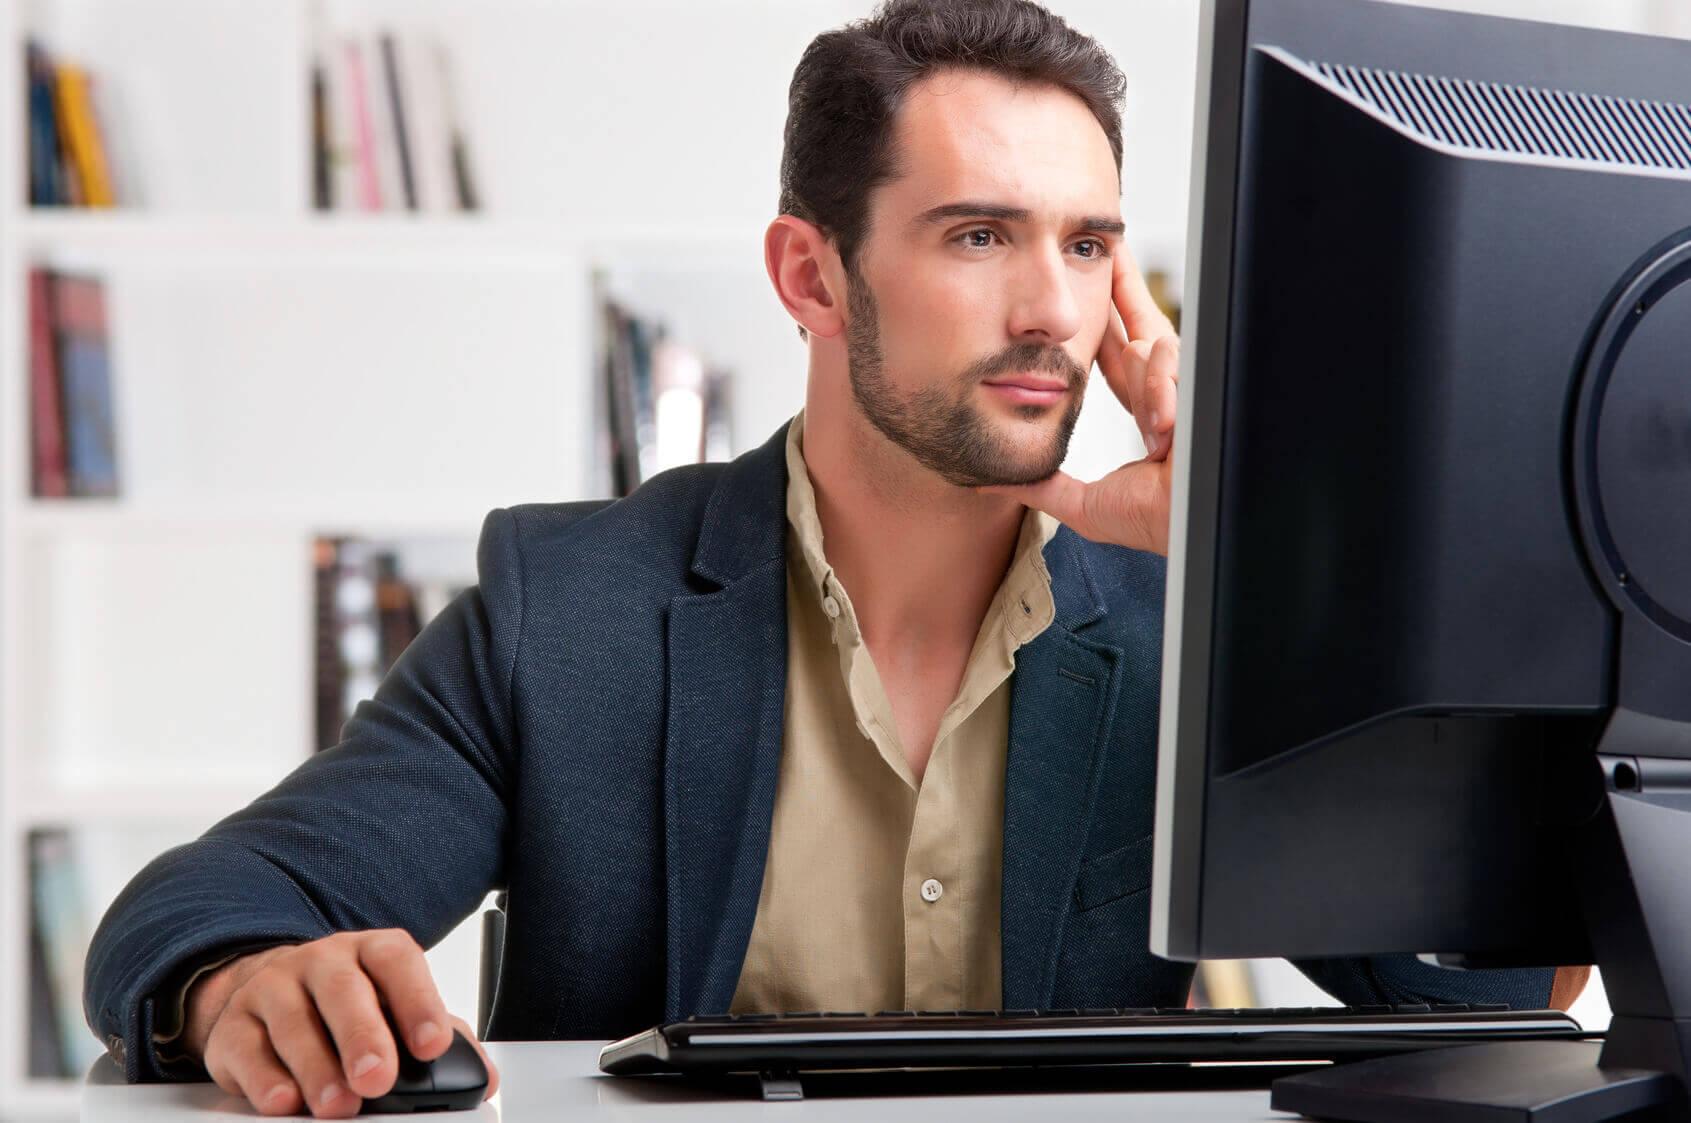 man looking online